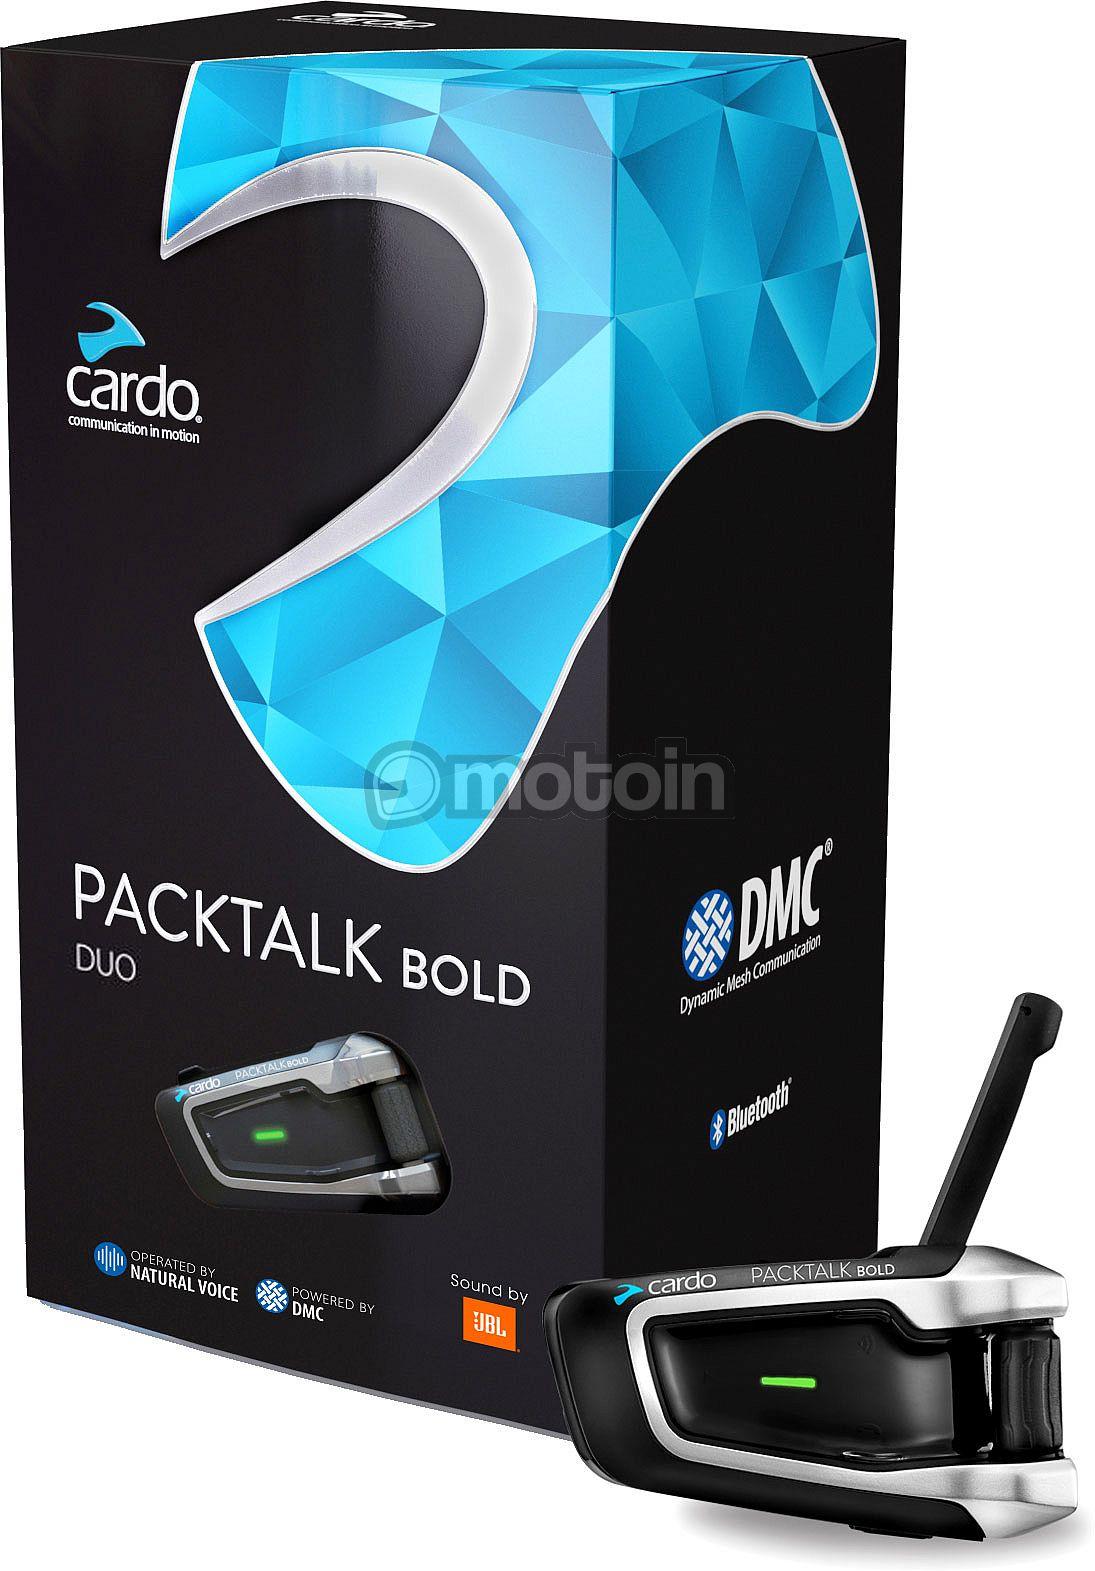 Kit de communication / Intercom double moto Cardo Packtalk Bold Duo (motoin.de)